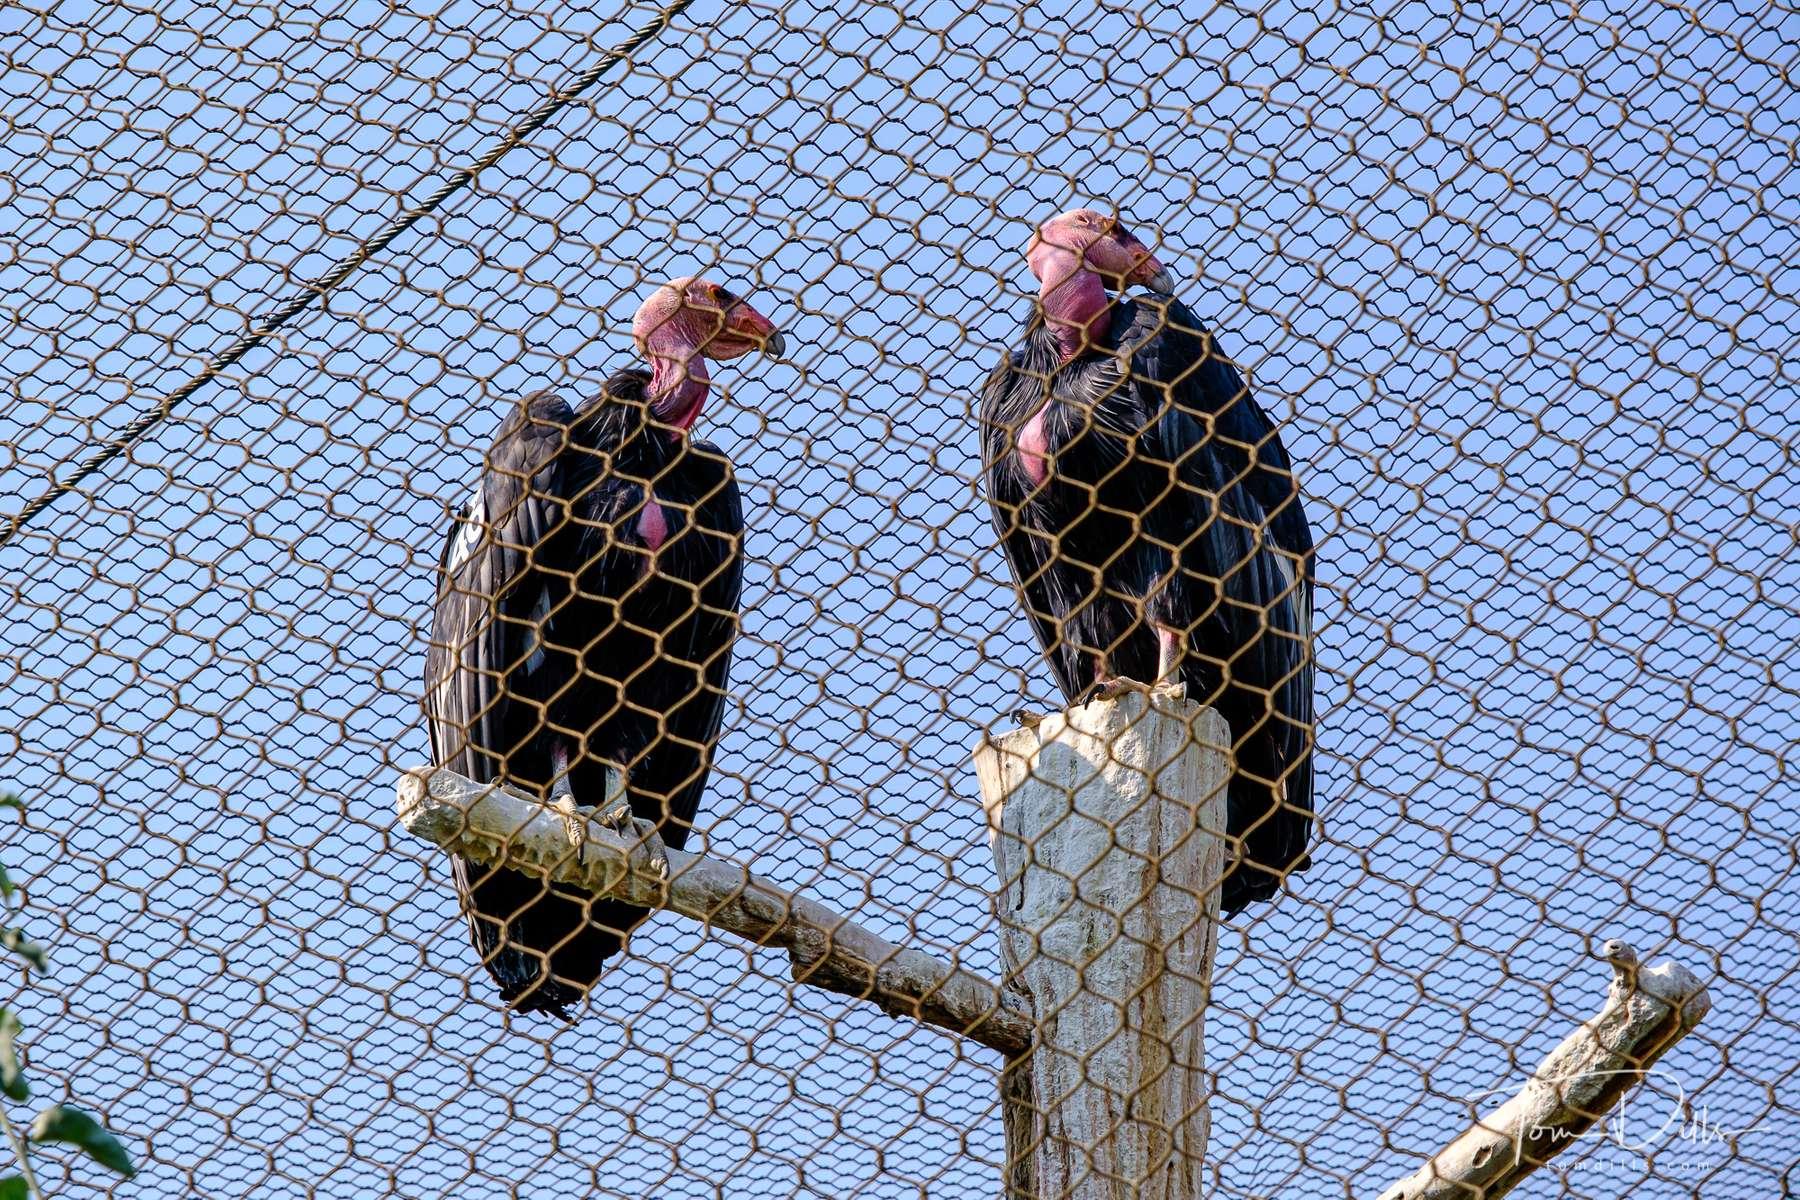 California Condors at the World Center for Birds of Prey in Boise, Idaho